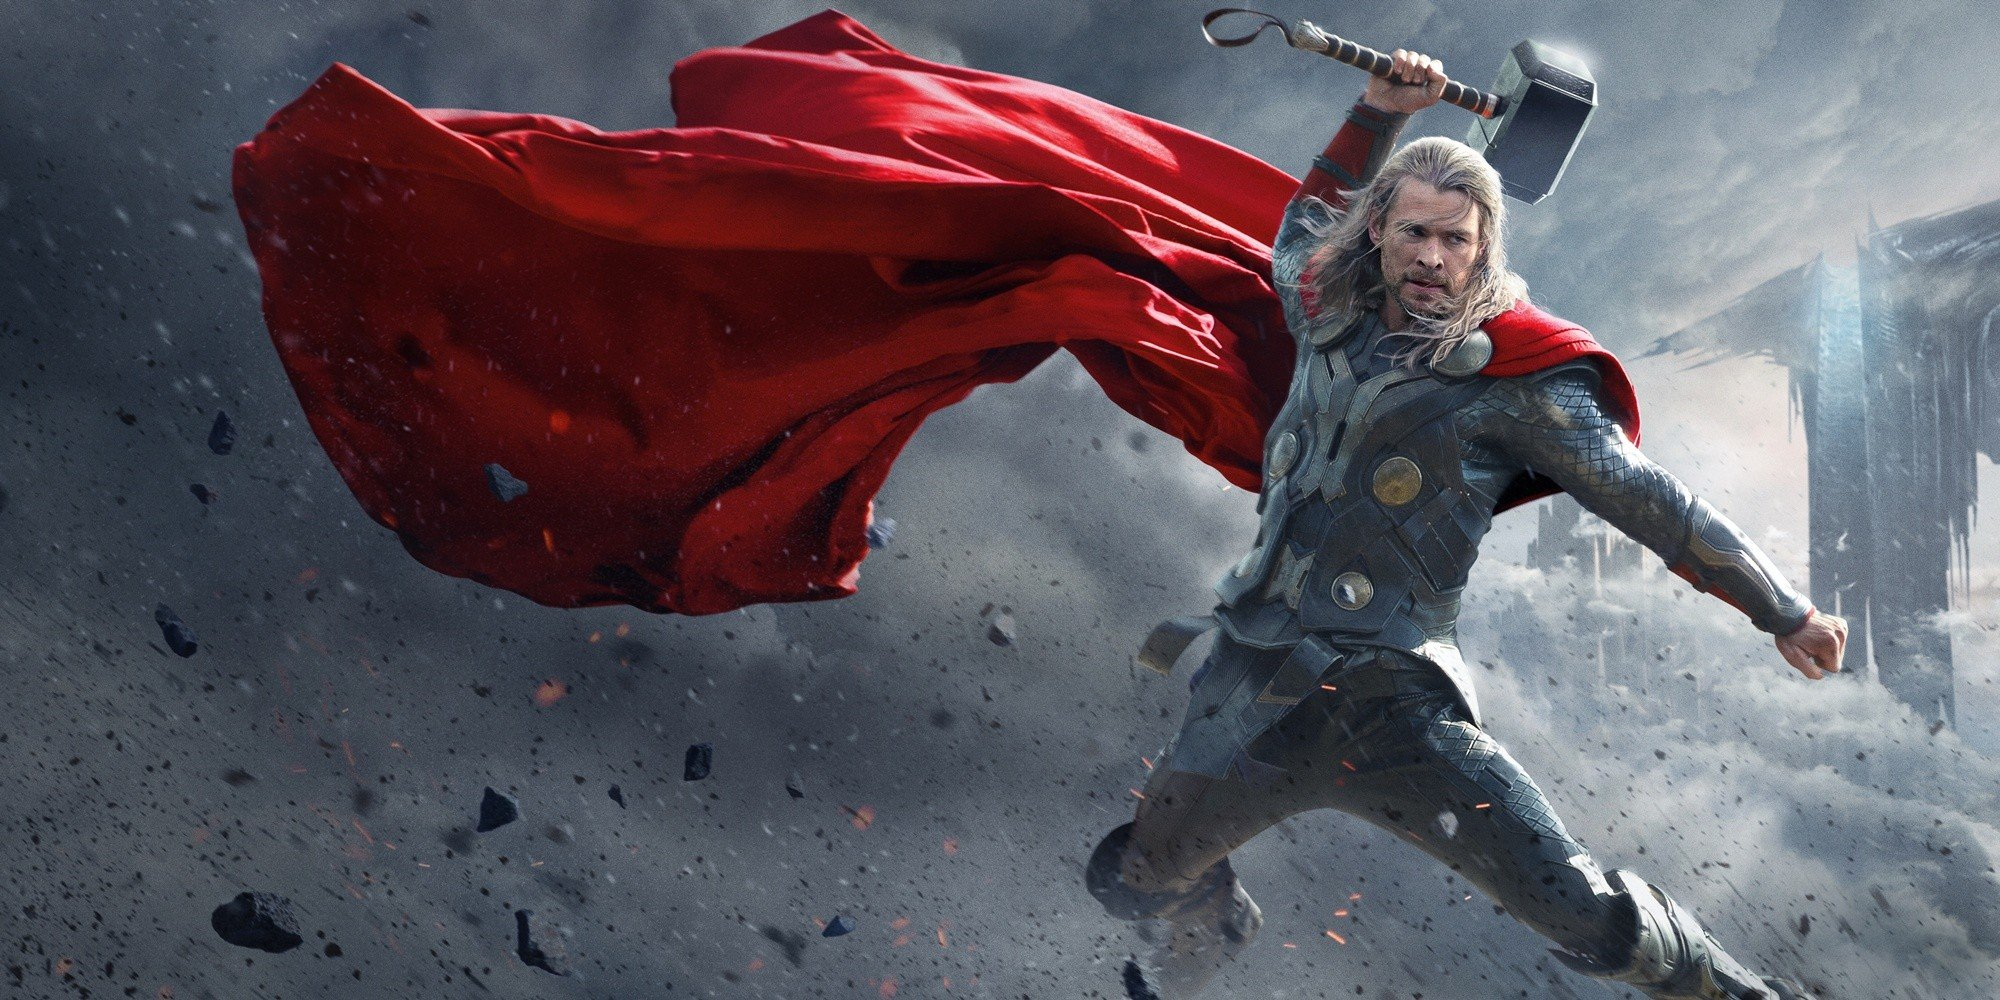 Thor 2 Ending Credits Kiss - phimvideo.org